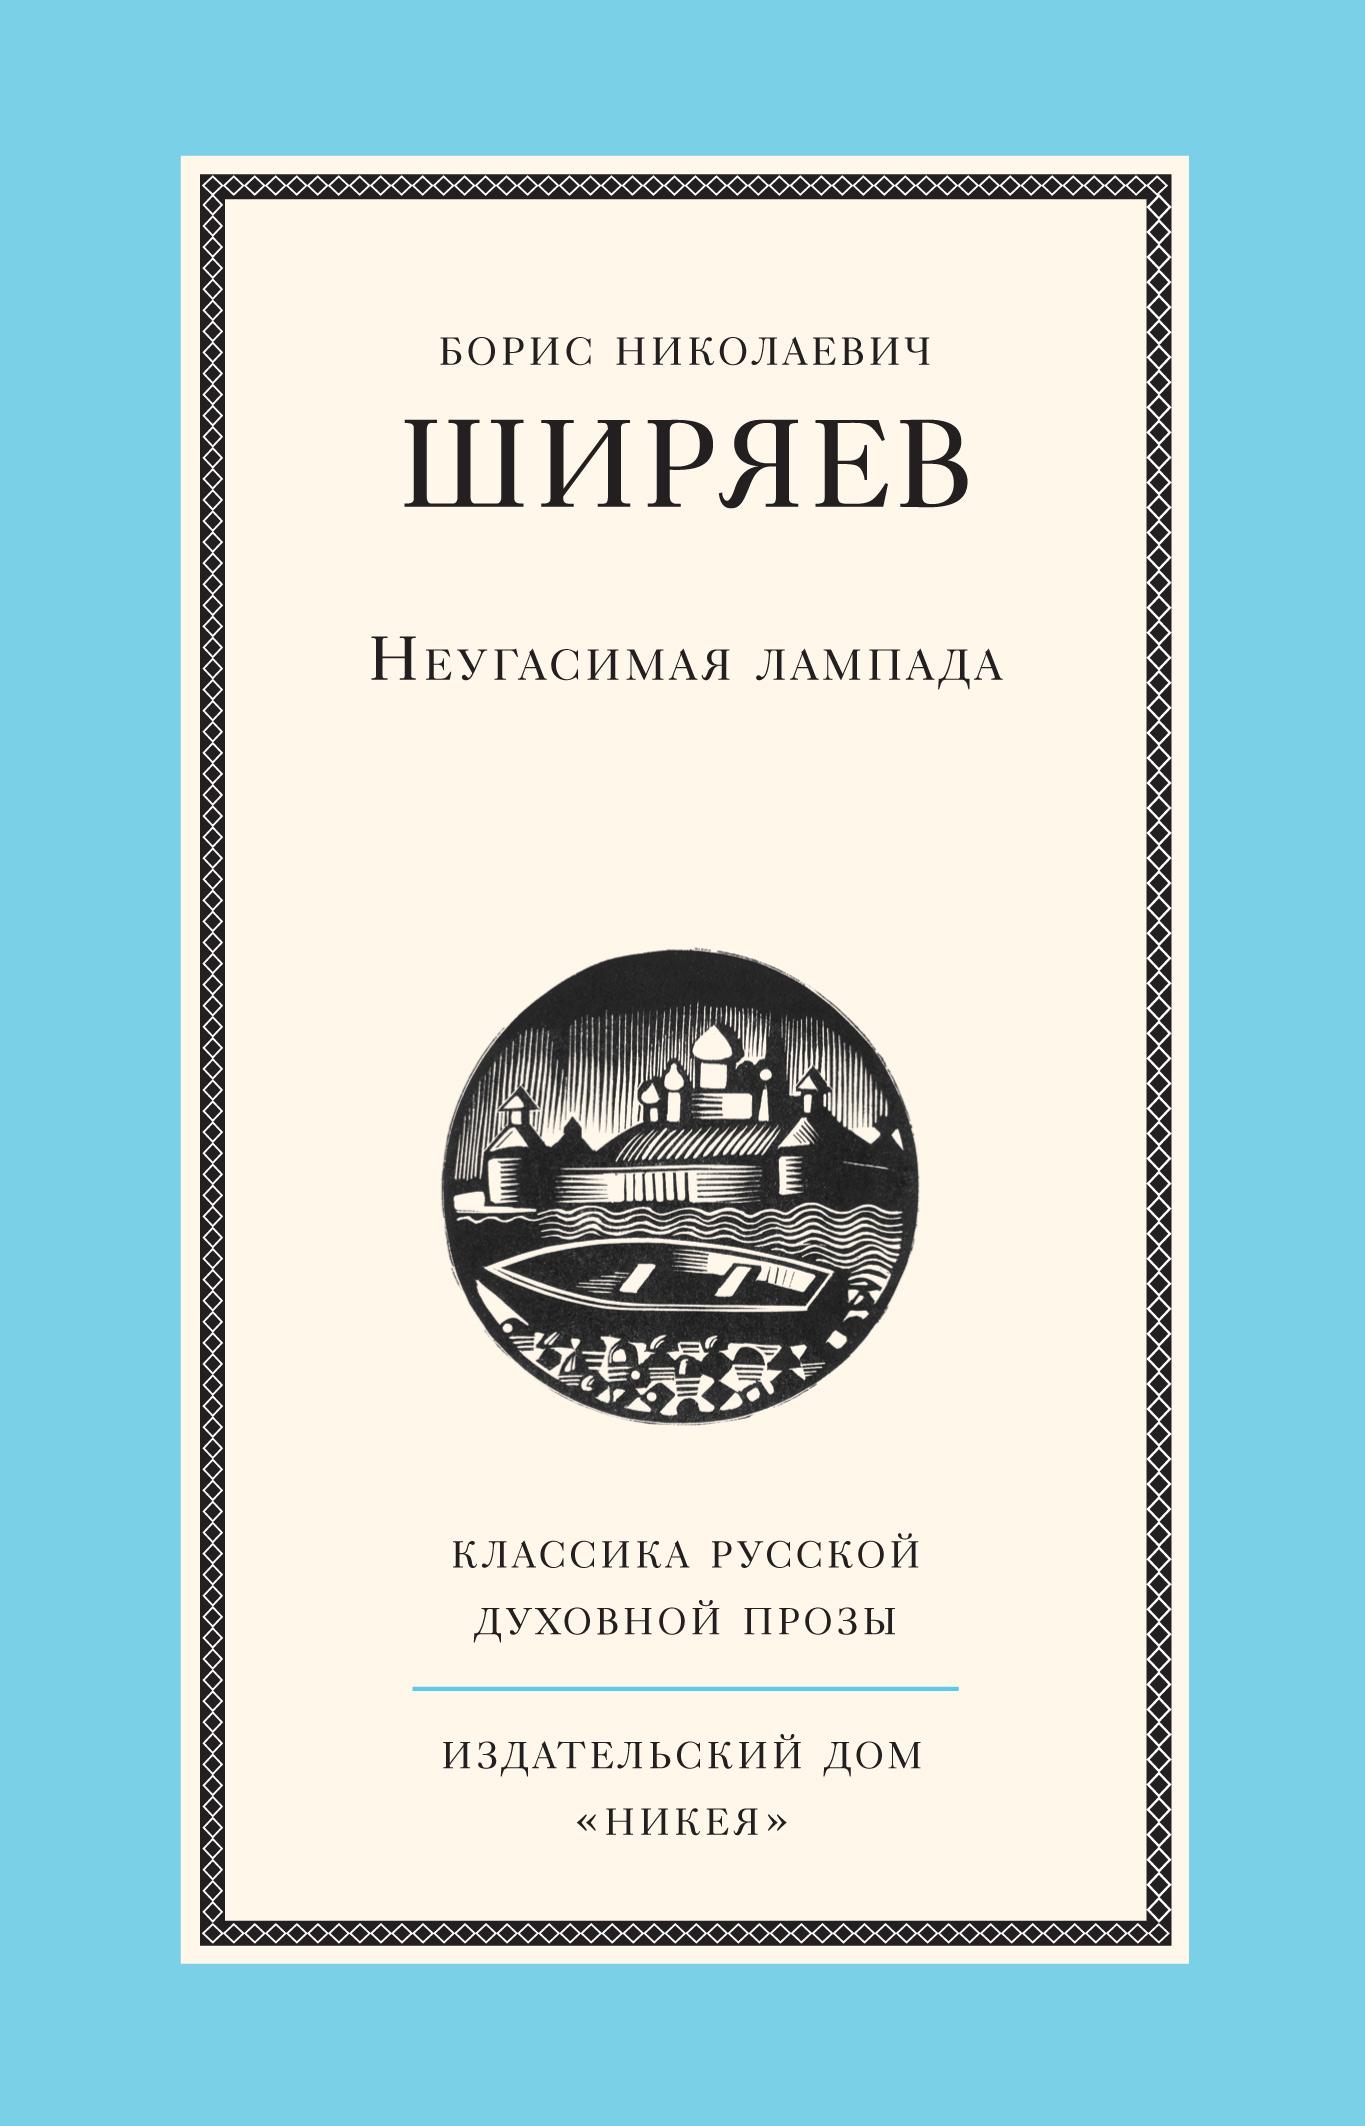 Борис Ширяев Неугасимая лампада мфу лазерное pantum m6500